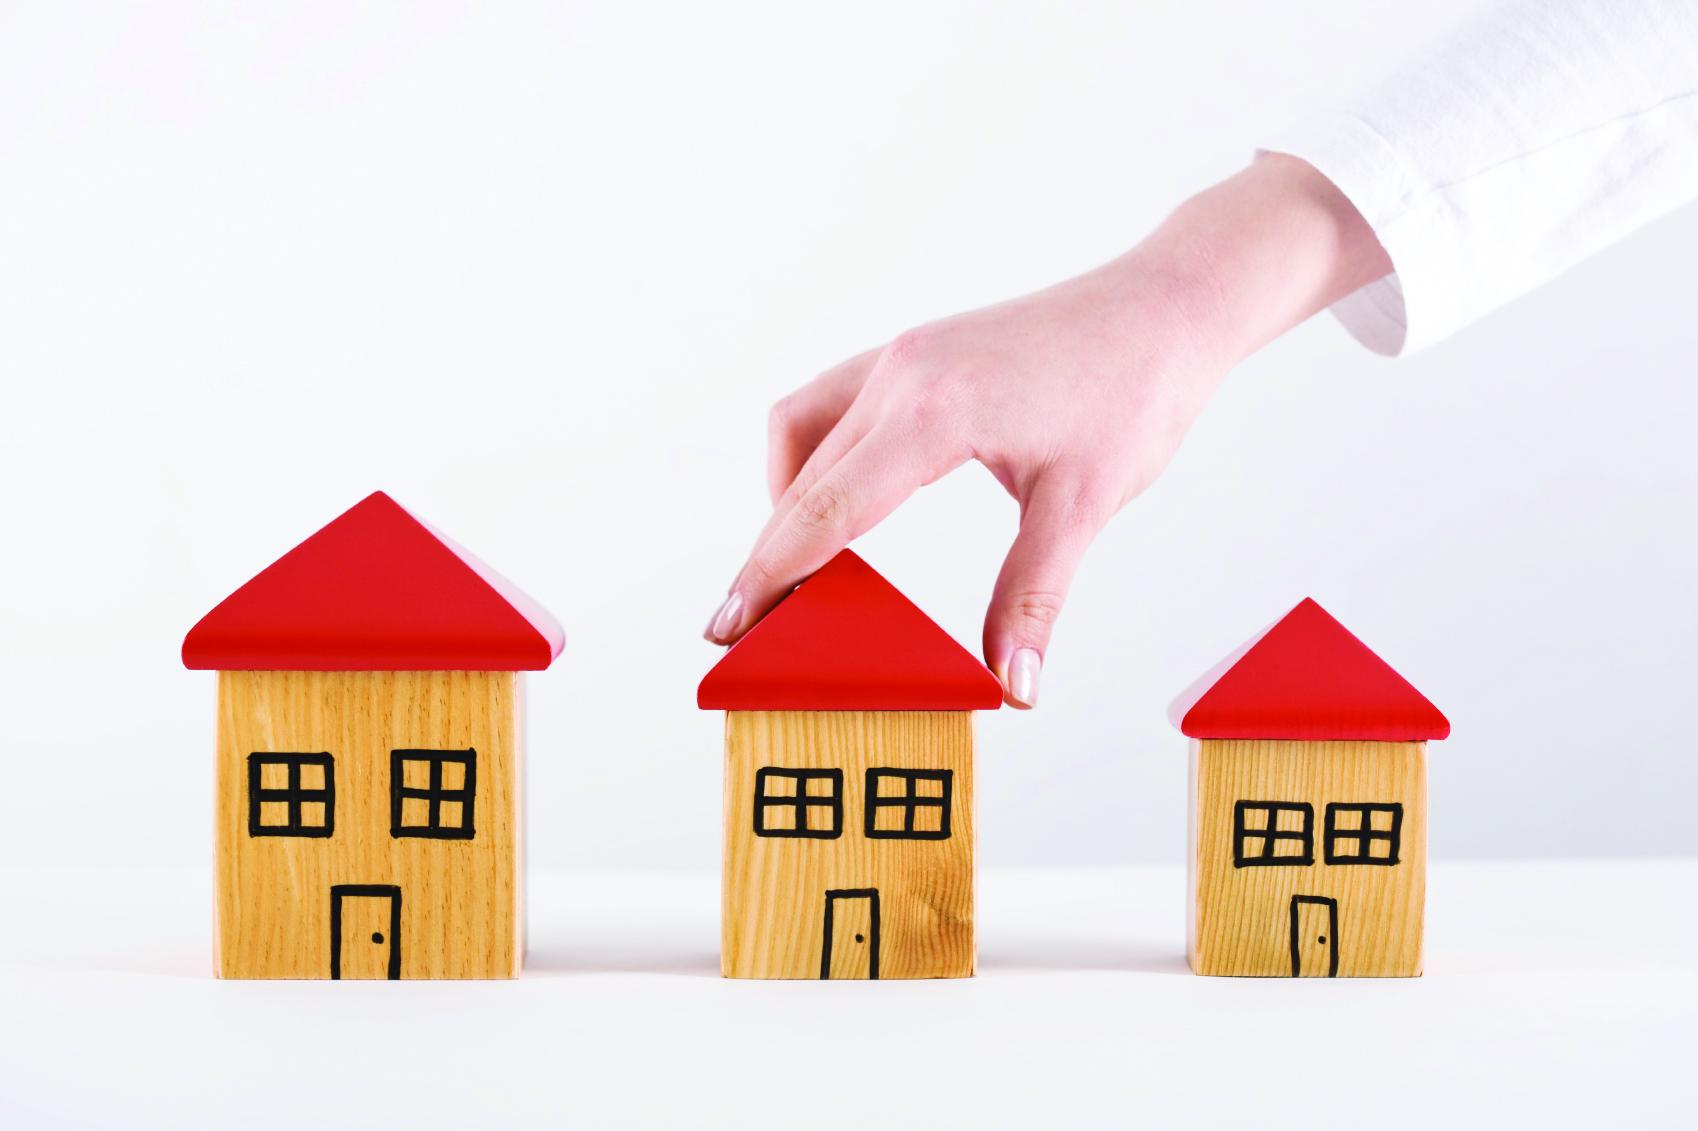 choosing-one-of-three-houses